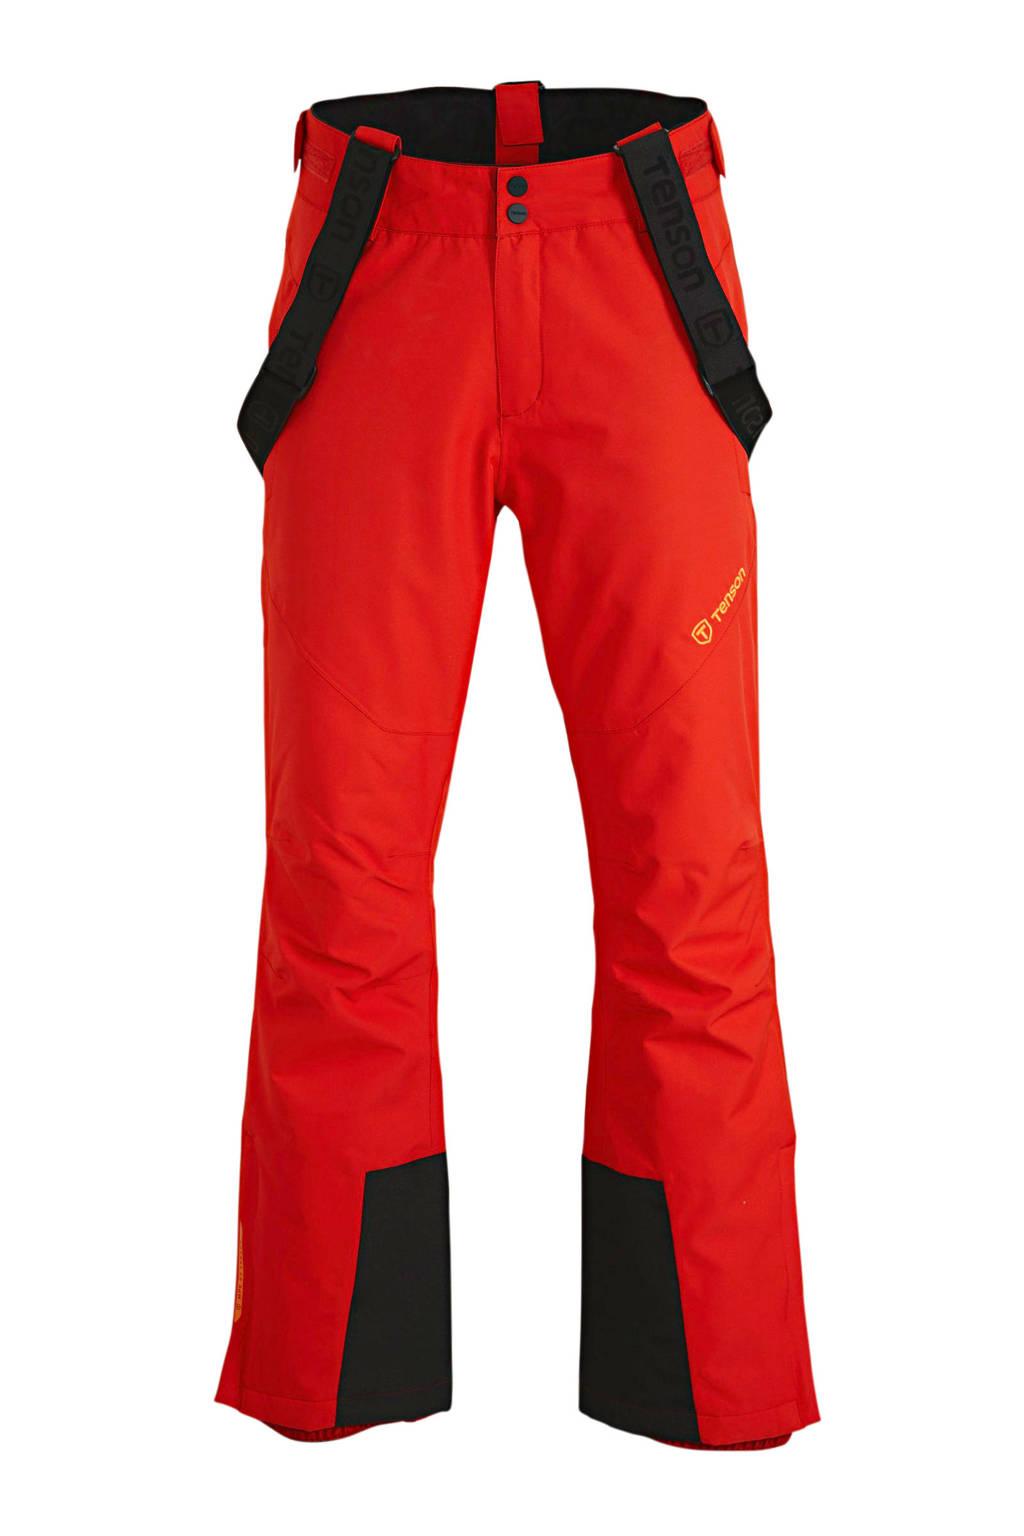 Tenson skibroek Radient rood, Rood